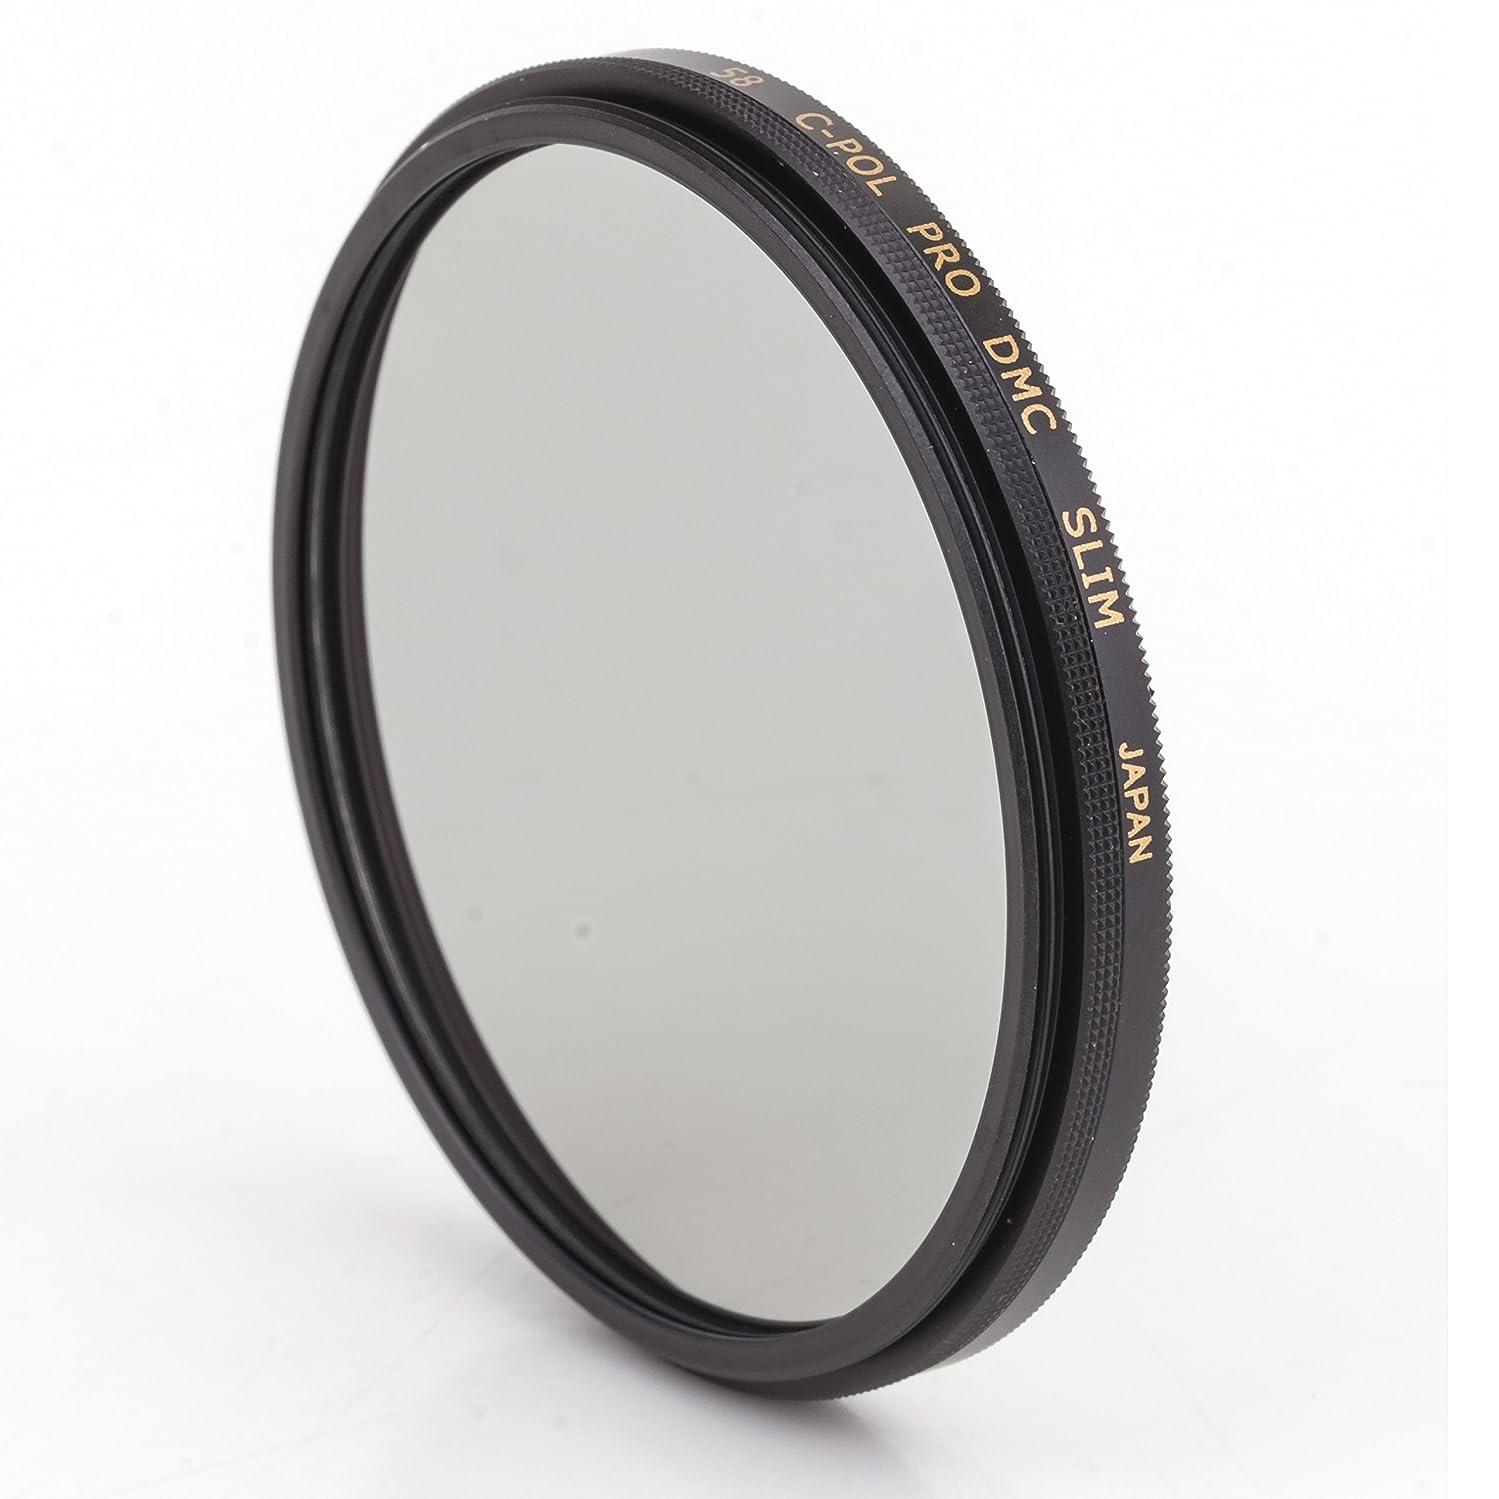 Pixco 82 mm Multi-Coating Circular-Polarizing Camera Filter/C-POL PRO DMC Slim MC CPL Filter